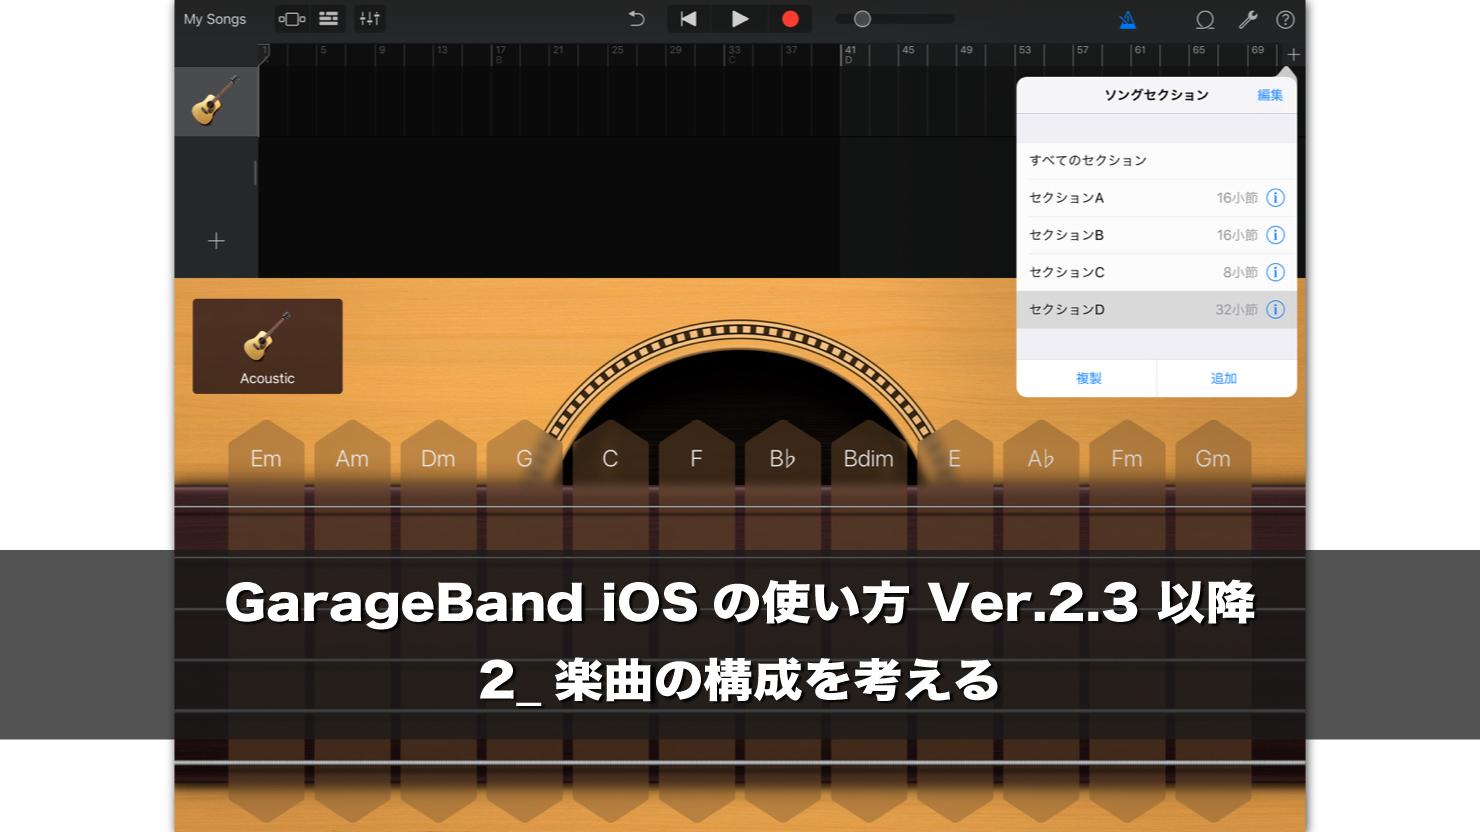 GarageBandiOS-ver2-3music-composition